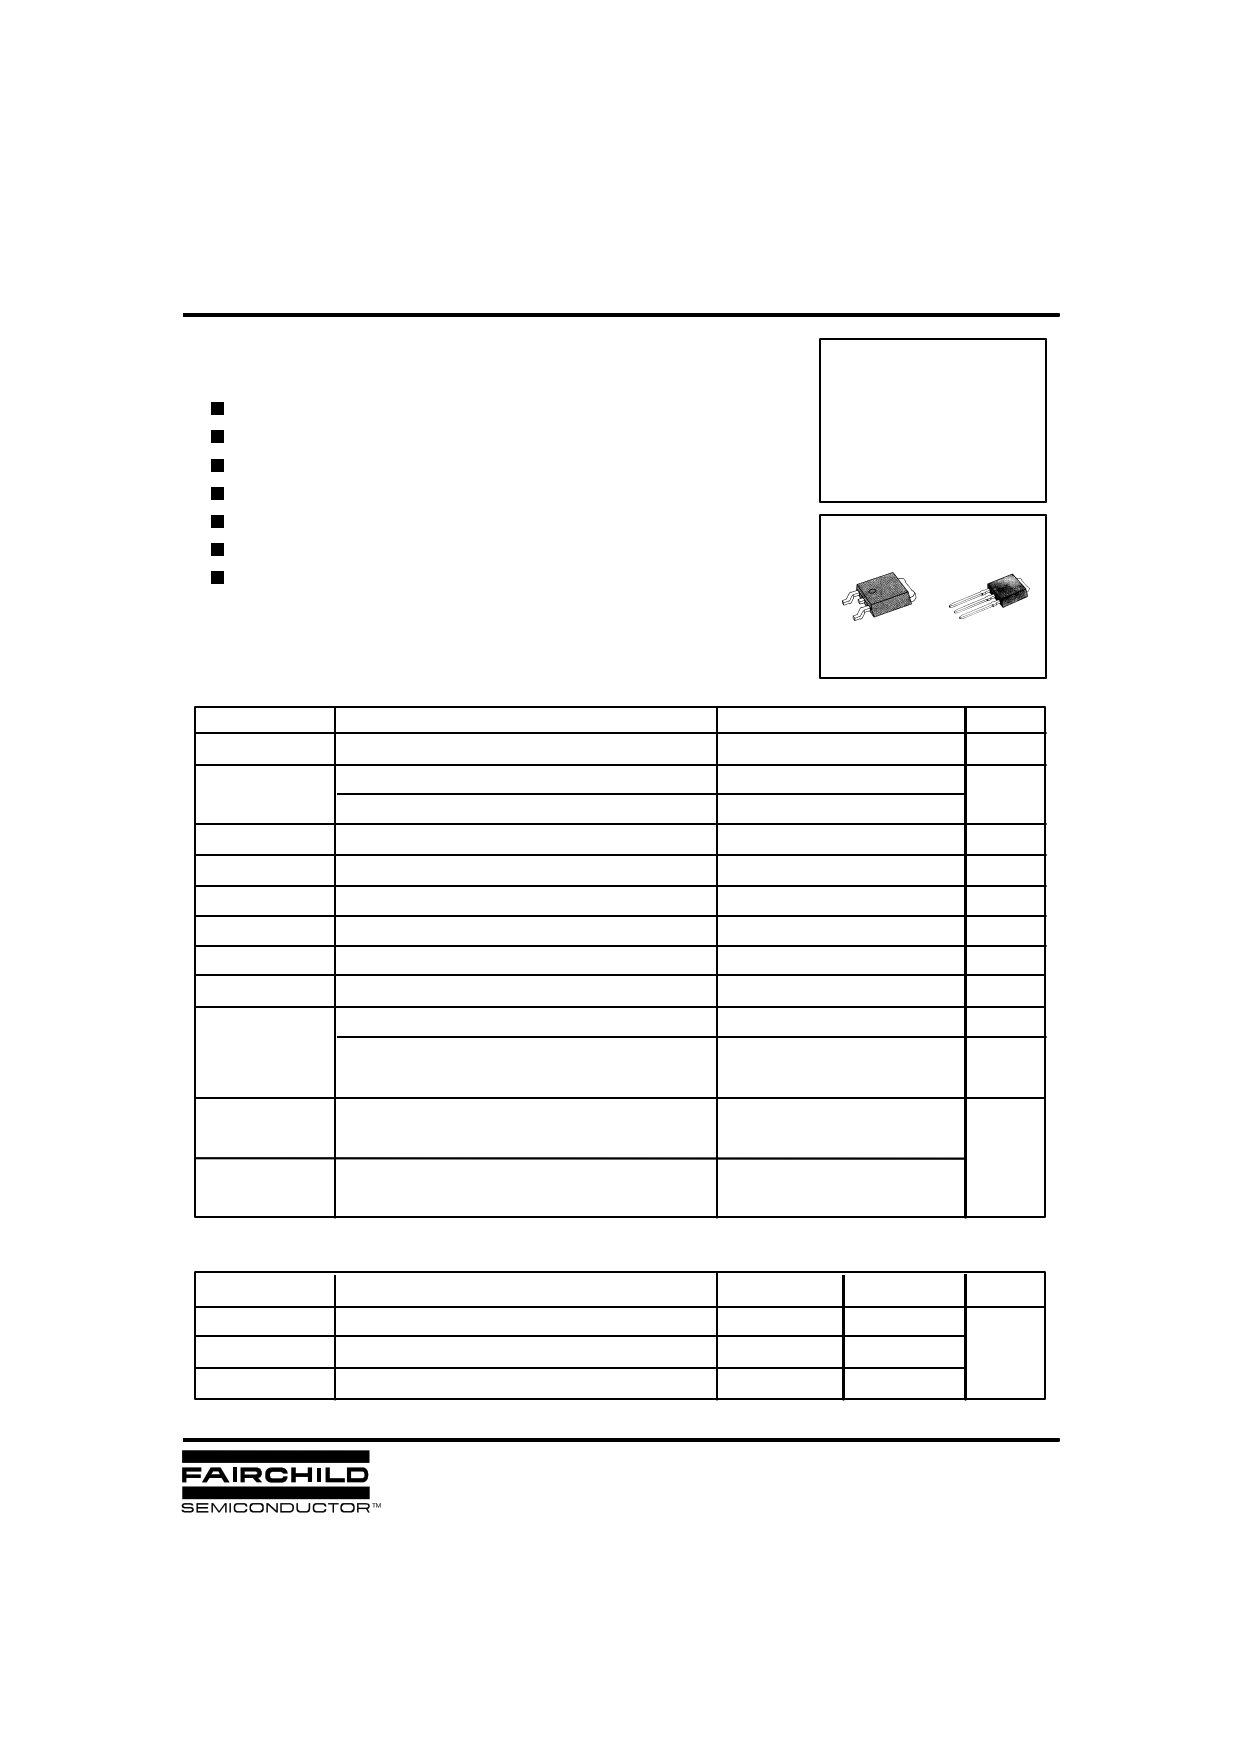 U130A datasheet